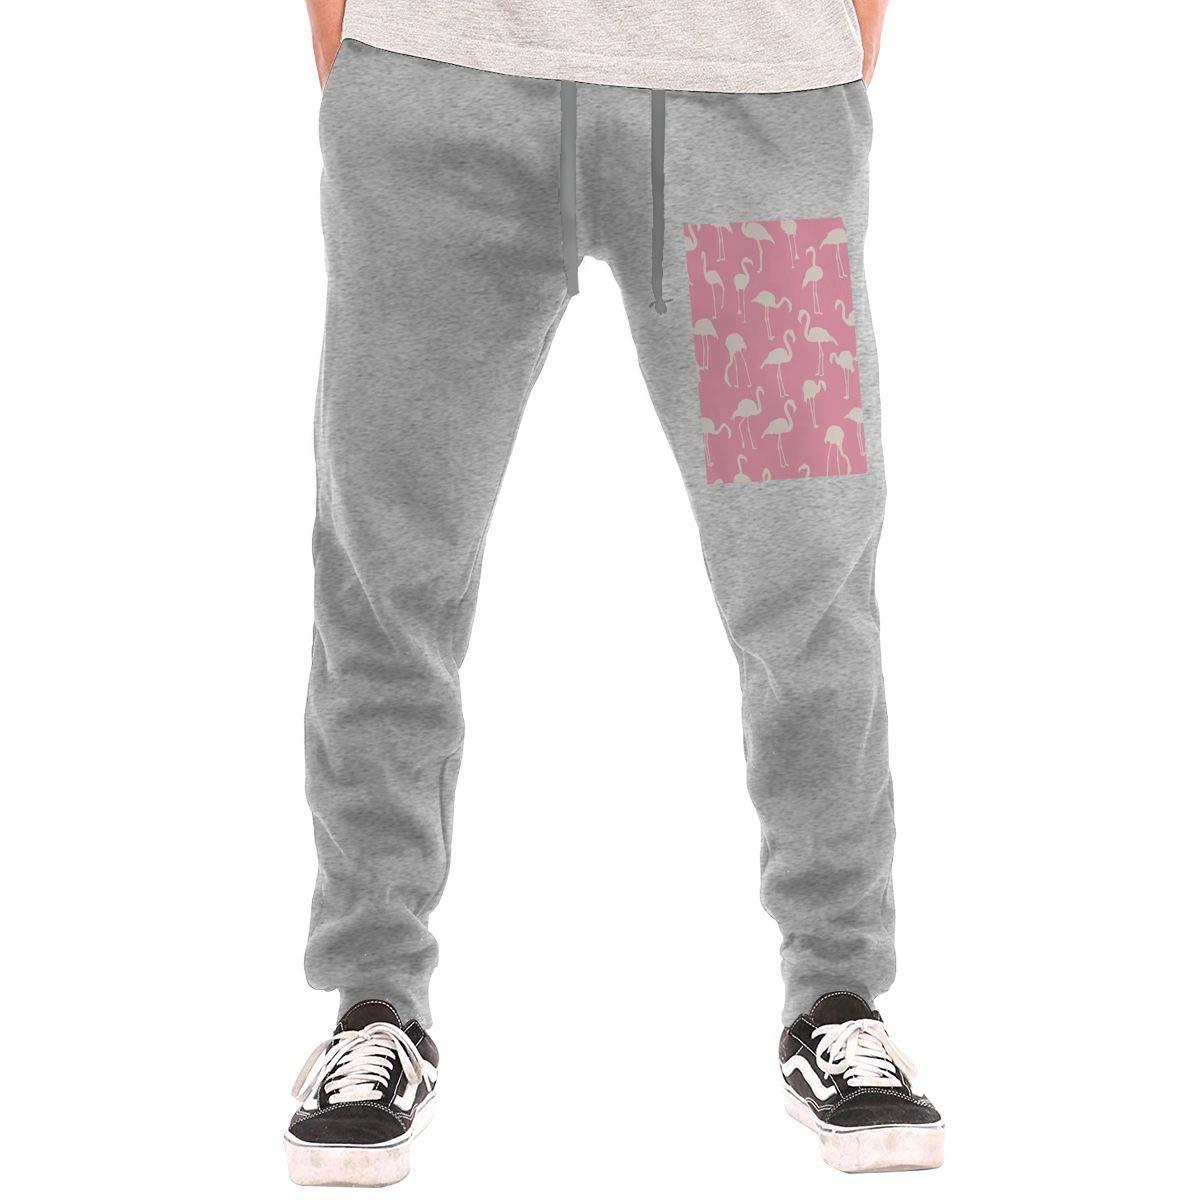 Flamingo Drawstring Waist,100/% Cotton,Elastic Waist Cuffed,Jogger Sweatpants